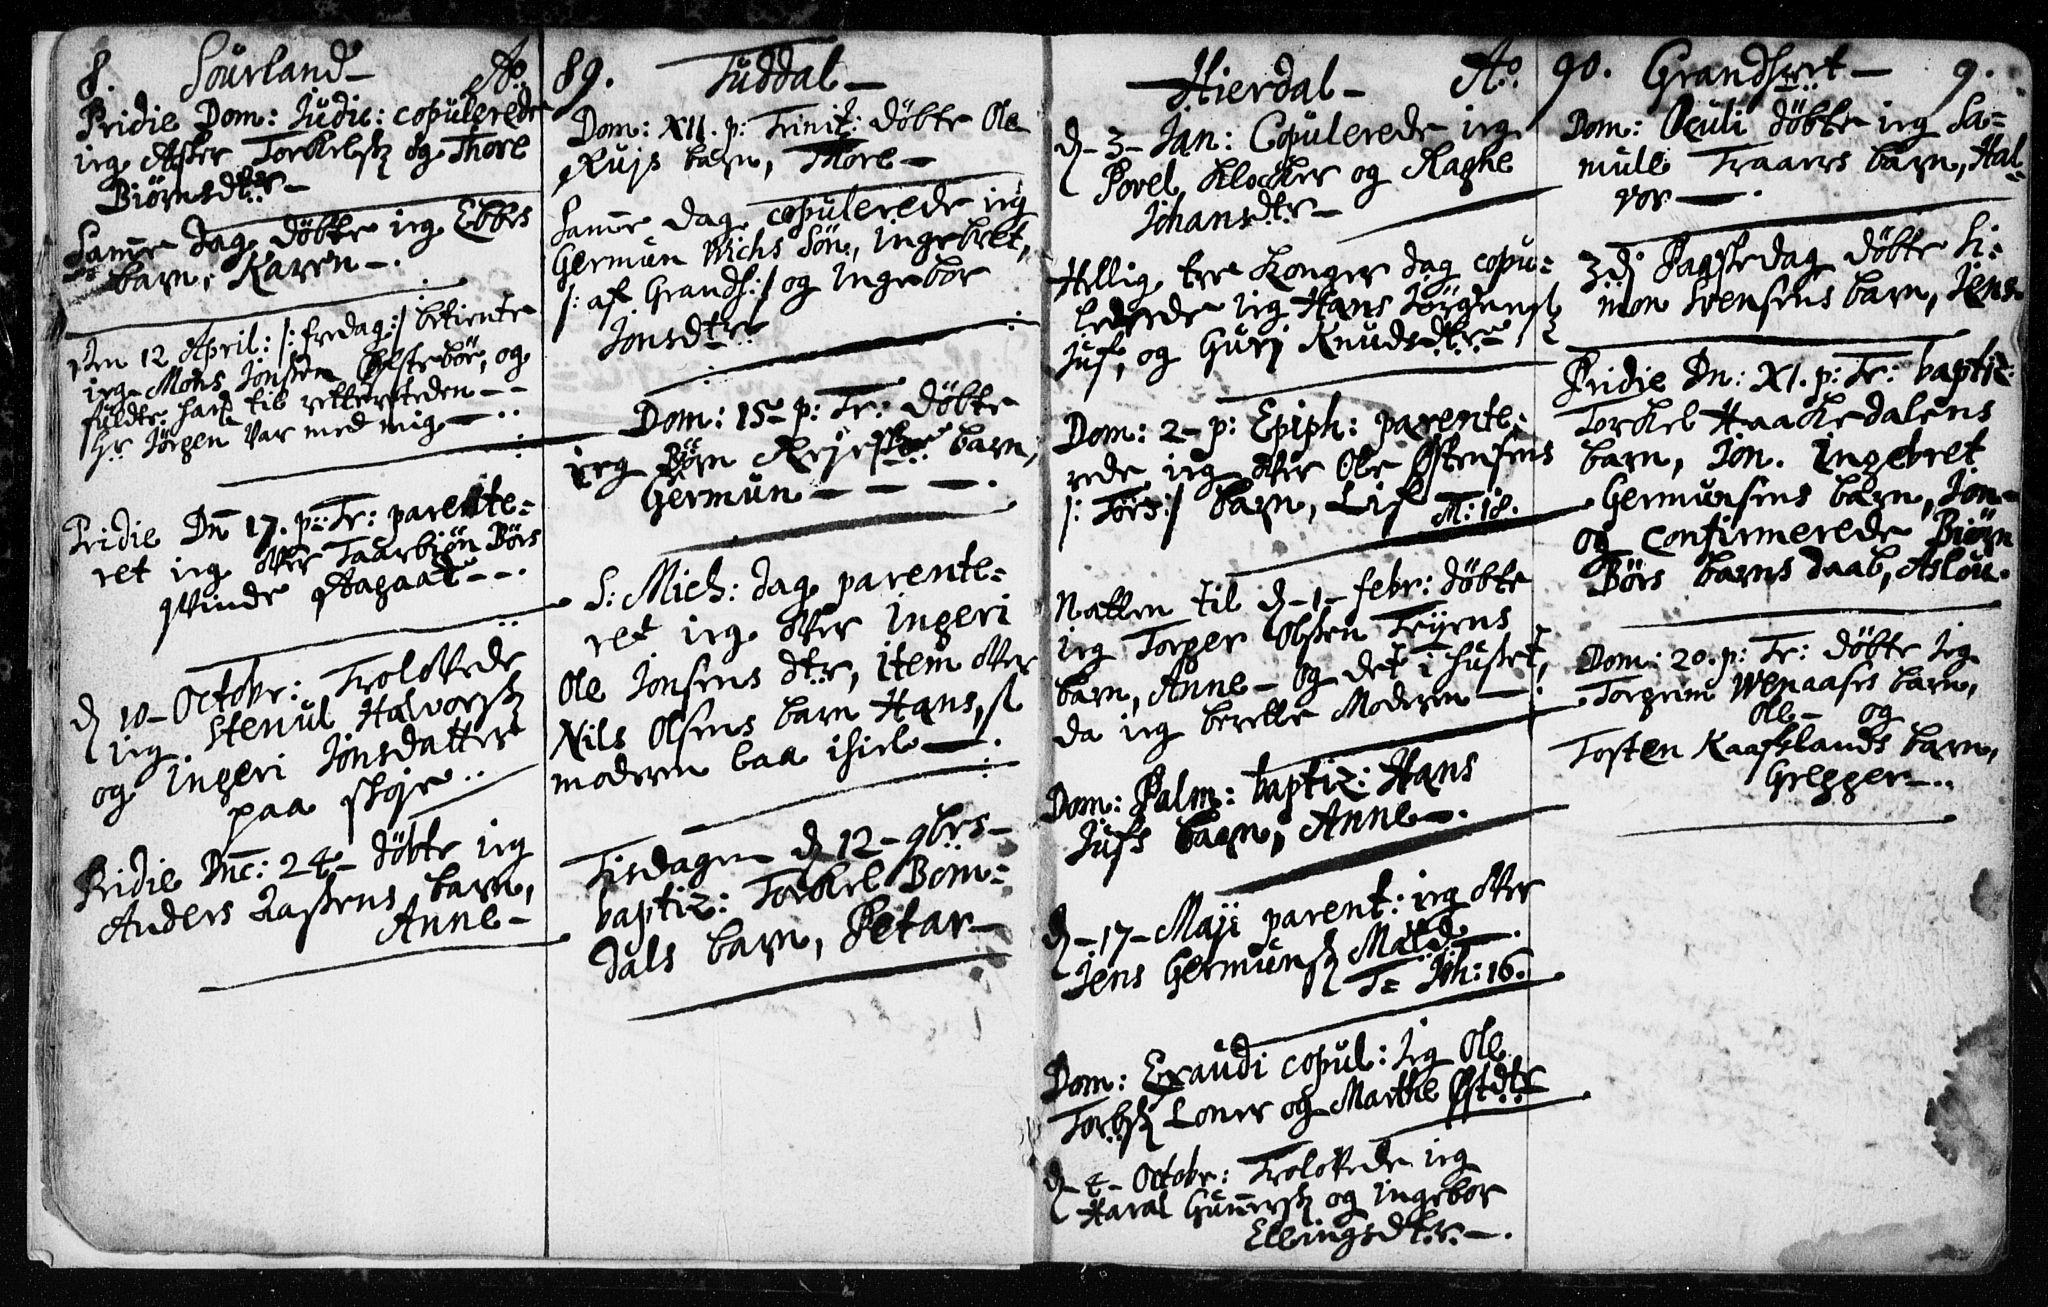 SAKO, Hjartdal kirkebøker, F/Fa/L0001: Ministerialbok nr. I 1, 1685-1714, s. 8-9